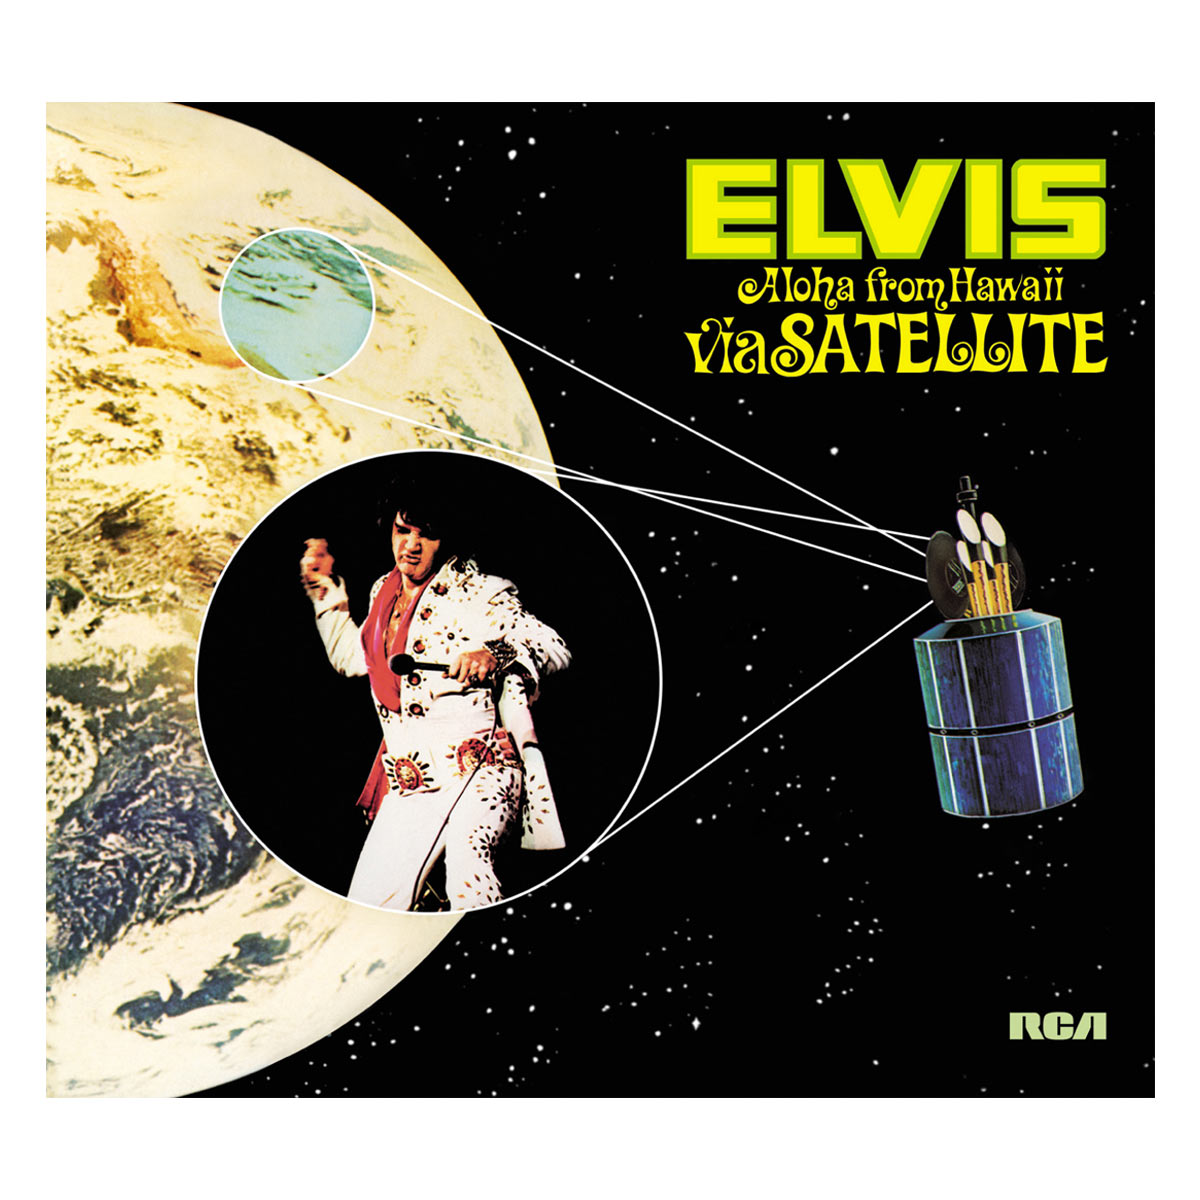 CD Duplo Elvis - Aloha From Hawaii Via Satellite Legacy Edition